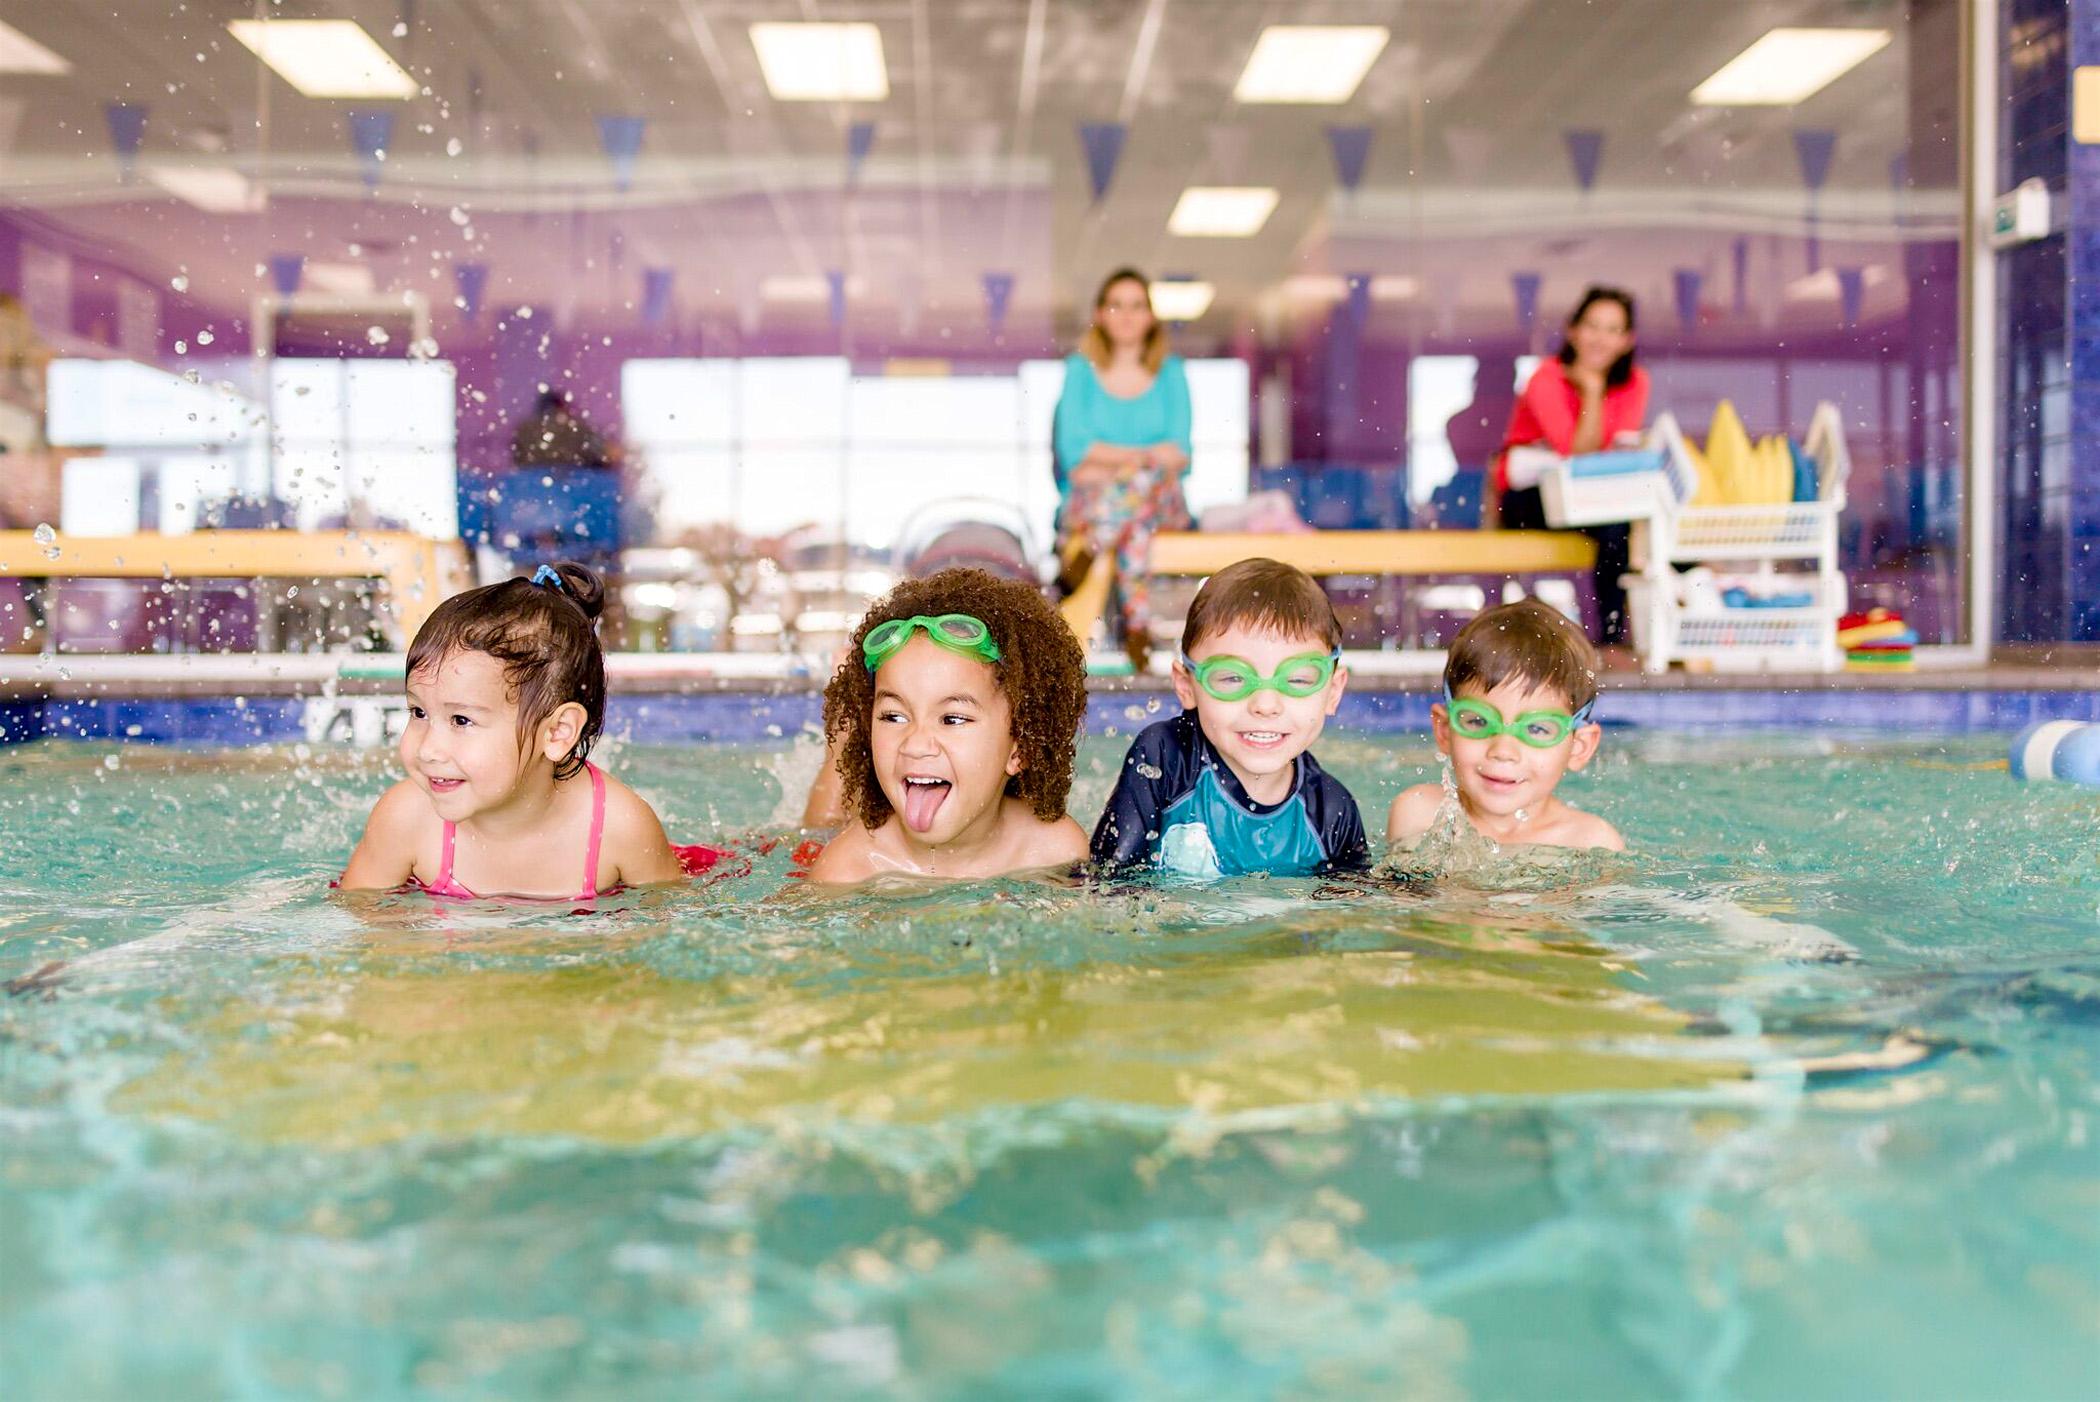 10 Year Round Adaptive Swim Lessons In Dallas Fort Worth Dfwchild